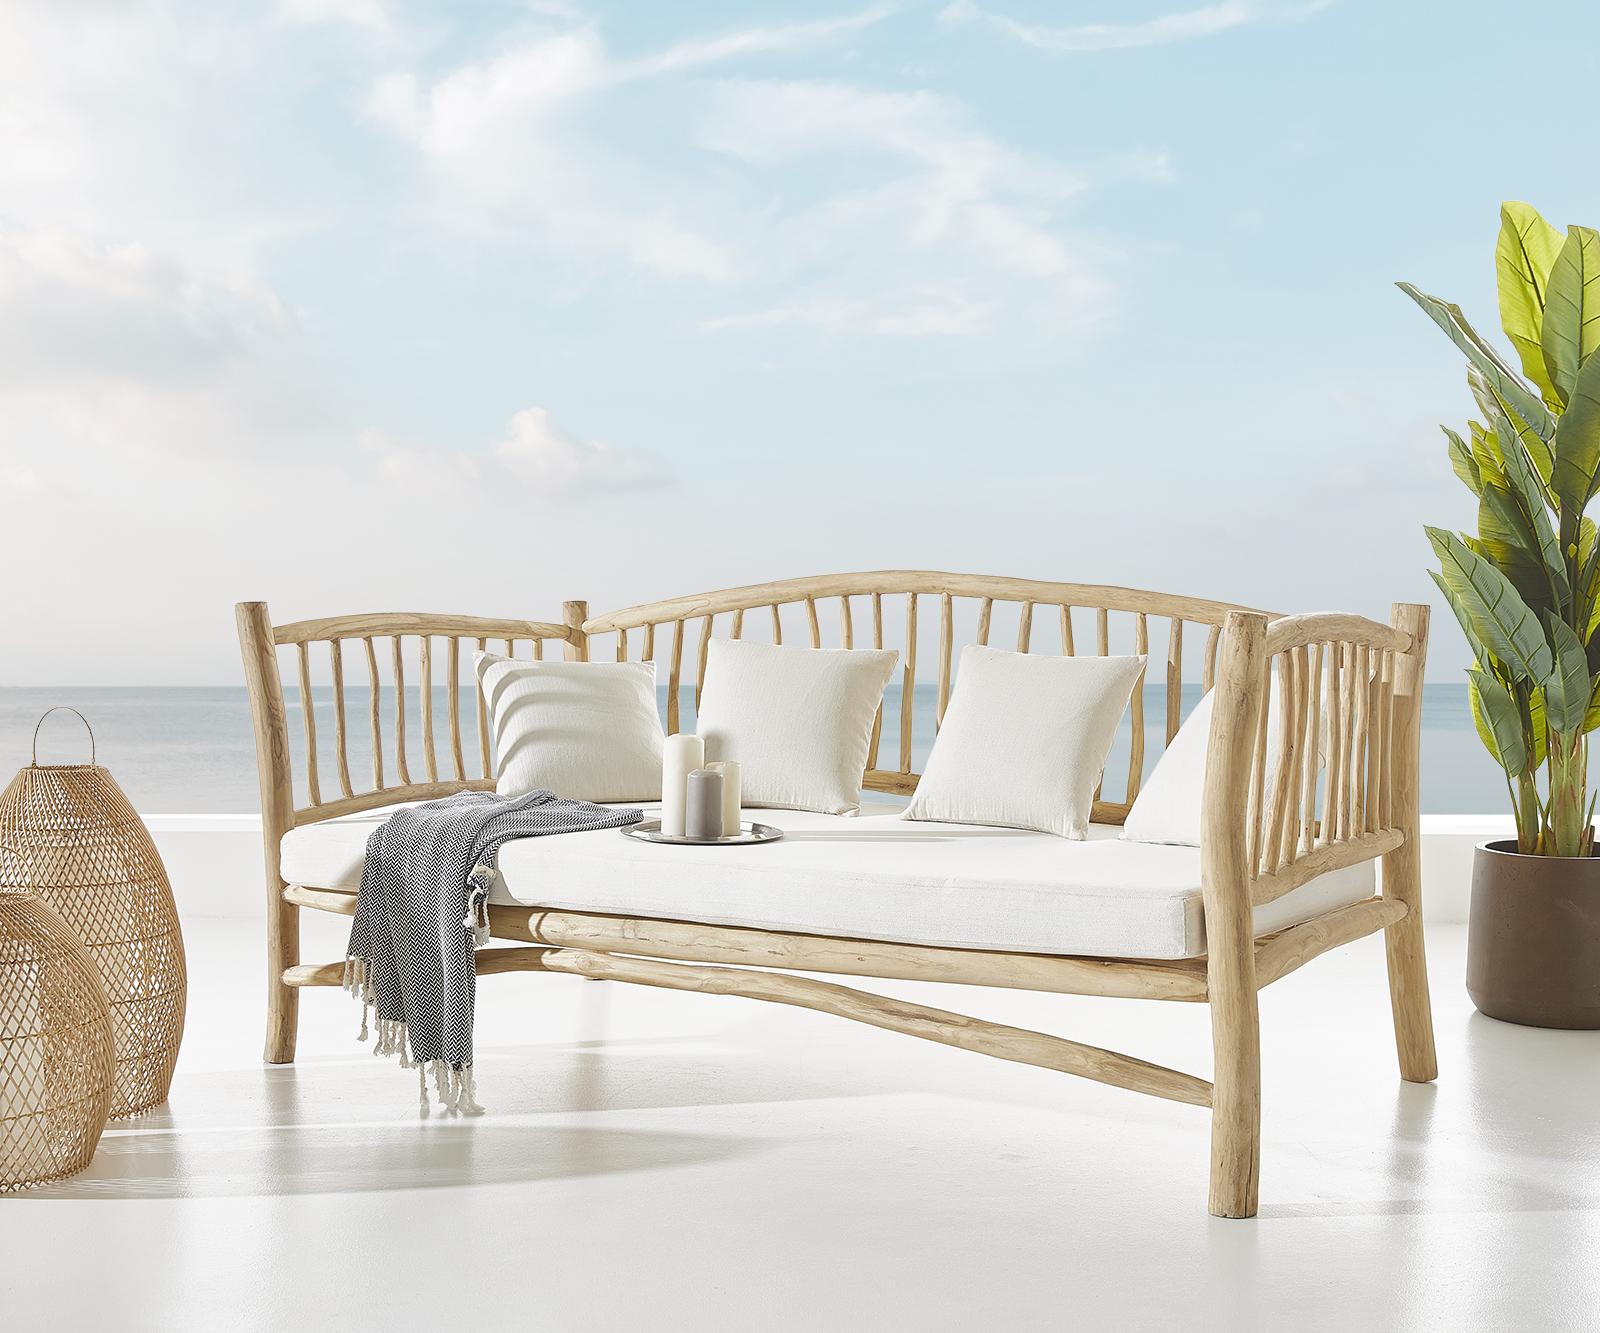 Outdoorsofa Melania 212x103 cm Teak Natur mit Kissen weiß